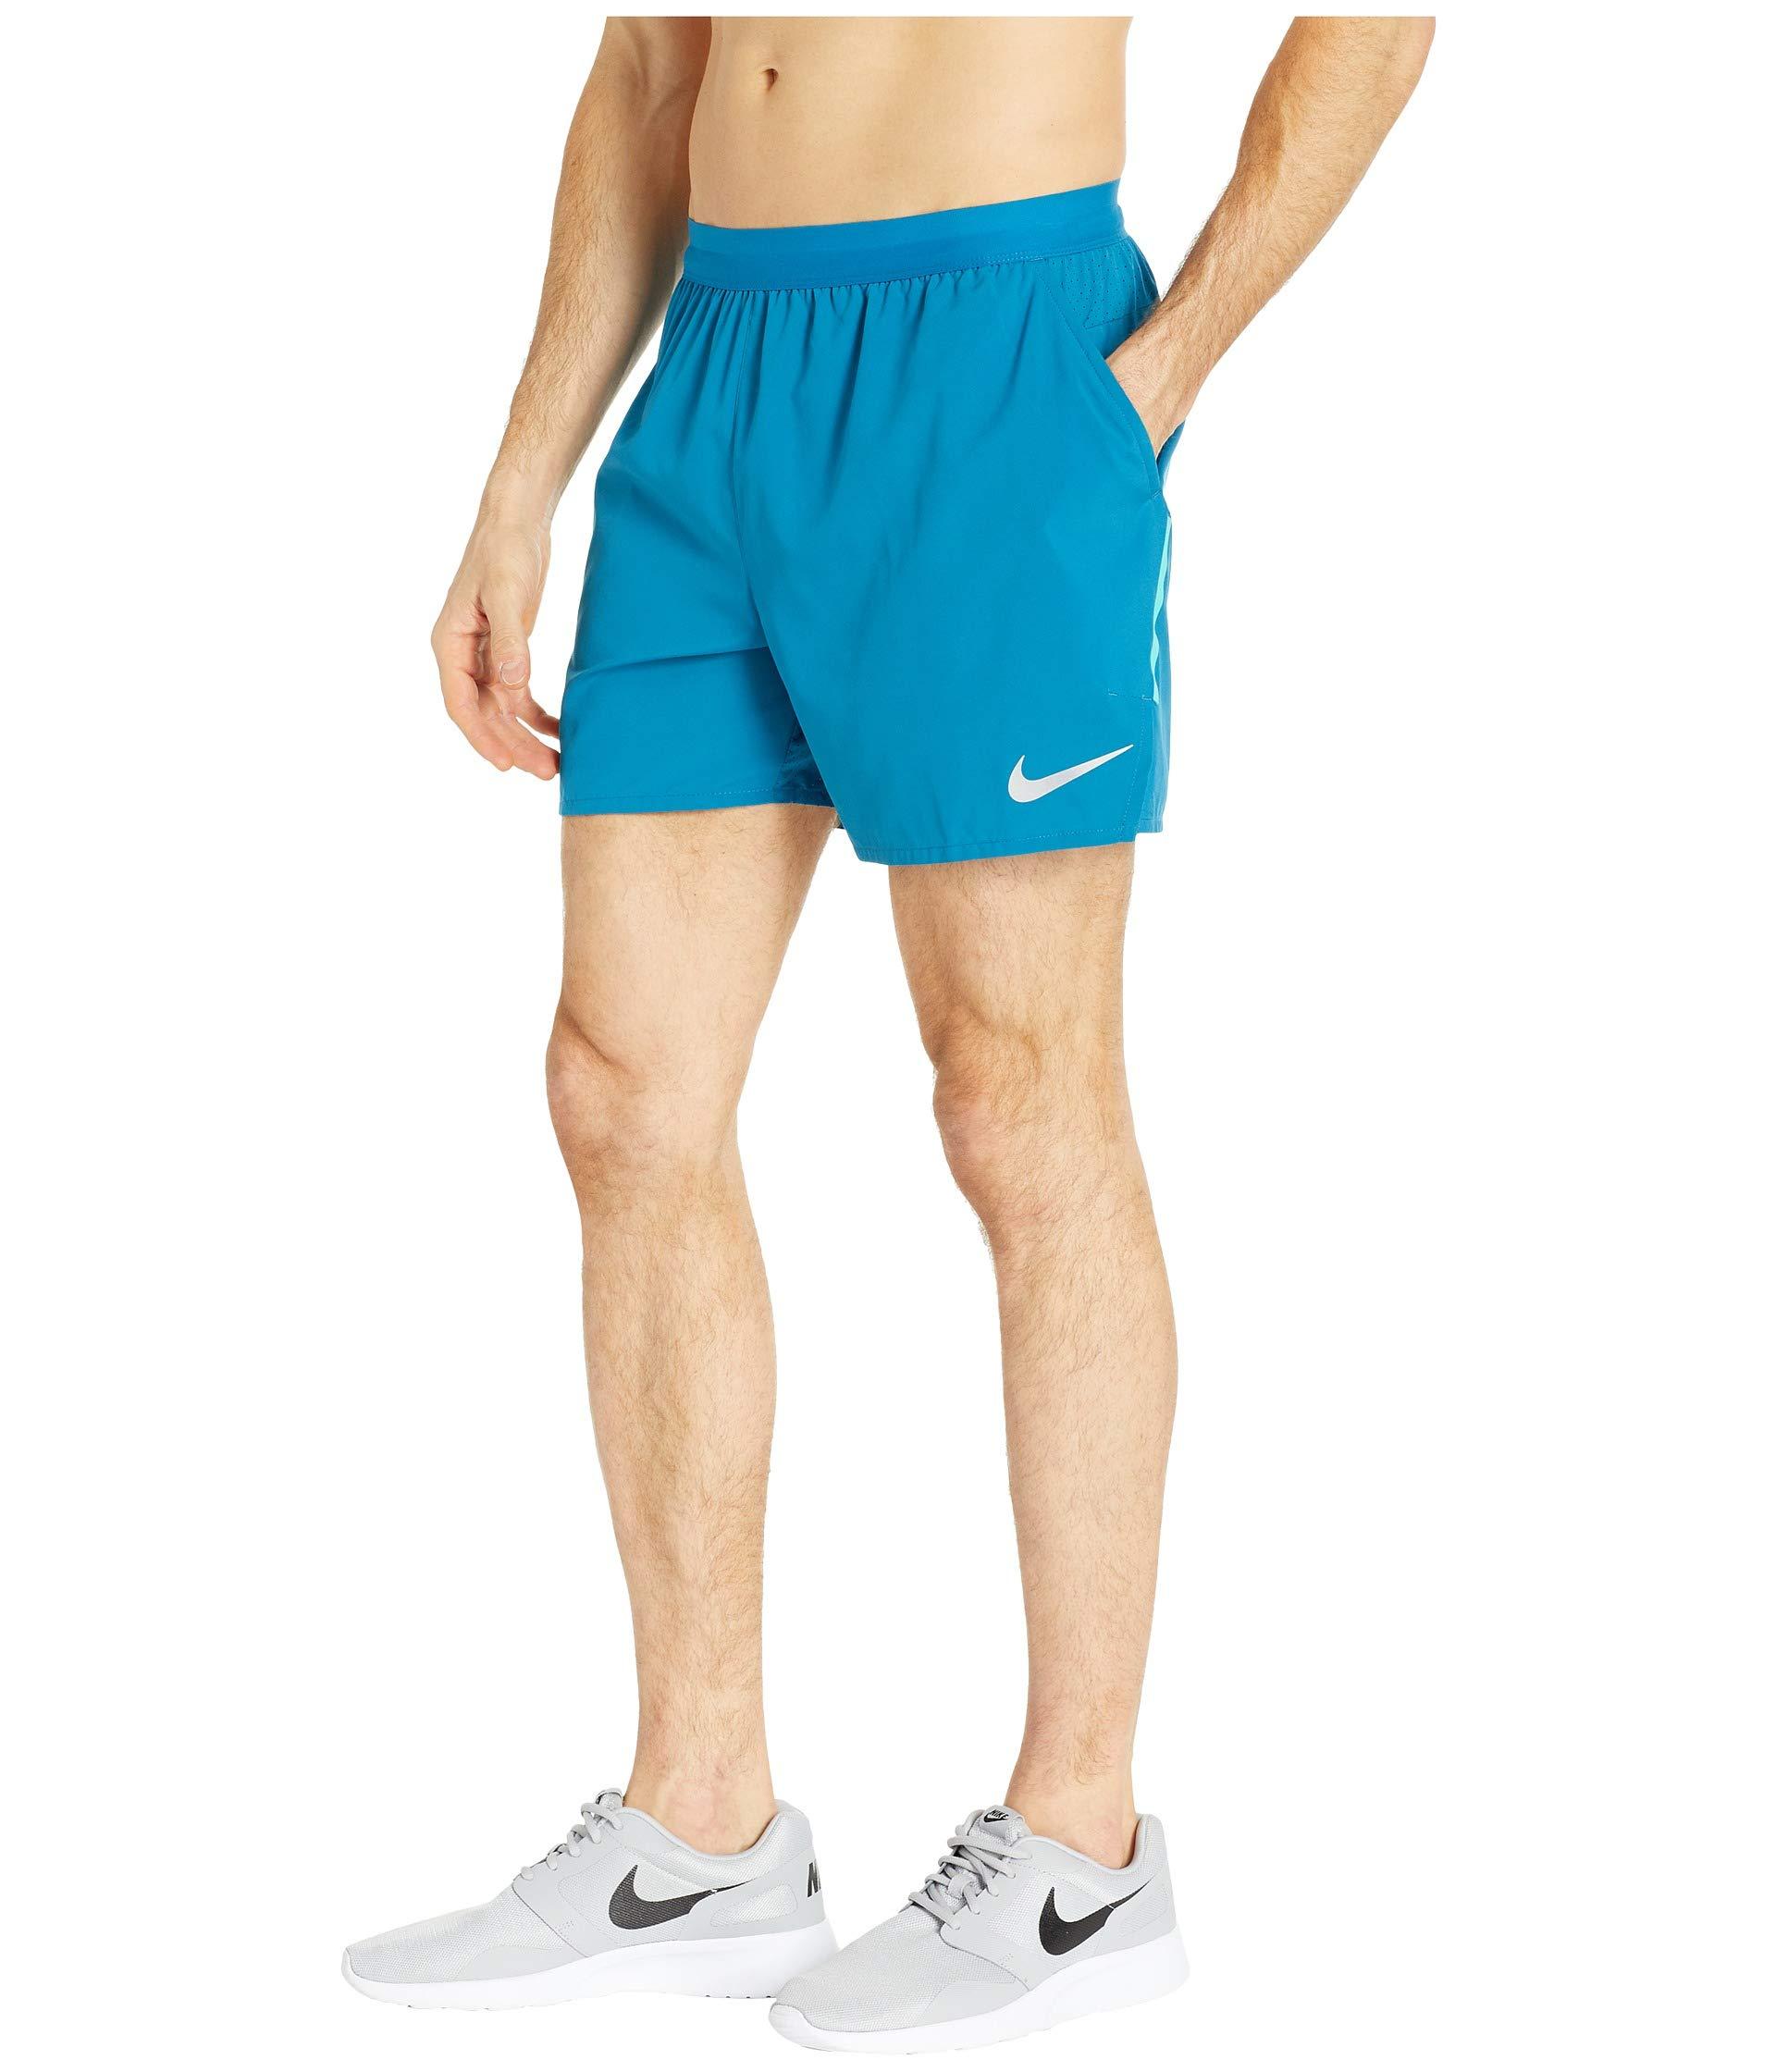 Nike Jade Abyss Stride Flex 5